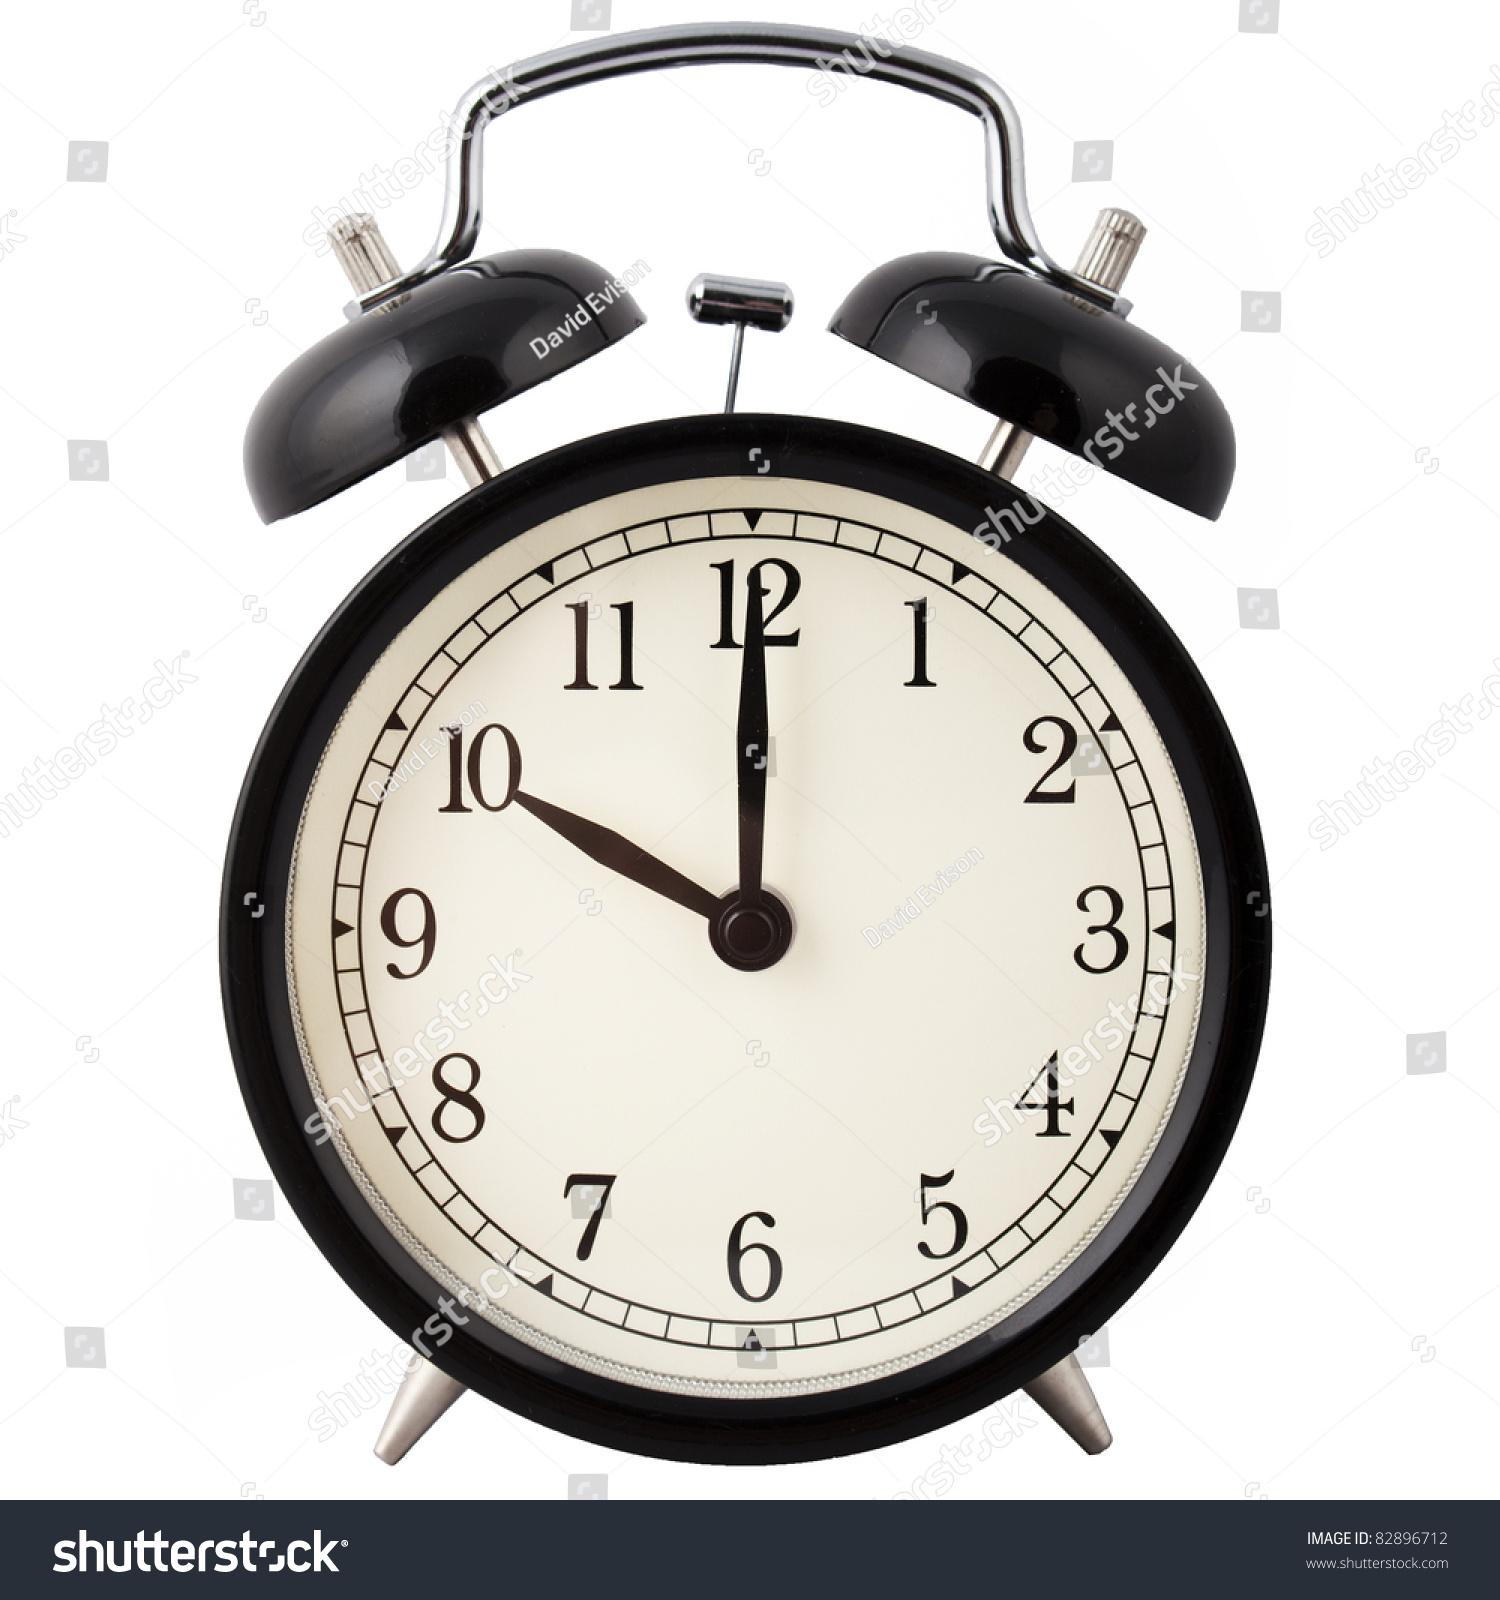 N47m 1arTMu3l680E1GBR0JDjW11weELele likewise 131164032755 together with Radioshack  pact Portable Am Fm Shortwave Radio furthermore Stock Image Blue Balls Image3843831 furthermore Retro Mini Vq Mini Tl Portable Bluetooth Dab Radio Blue 10154553 Pdt. on alarm clock green